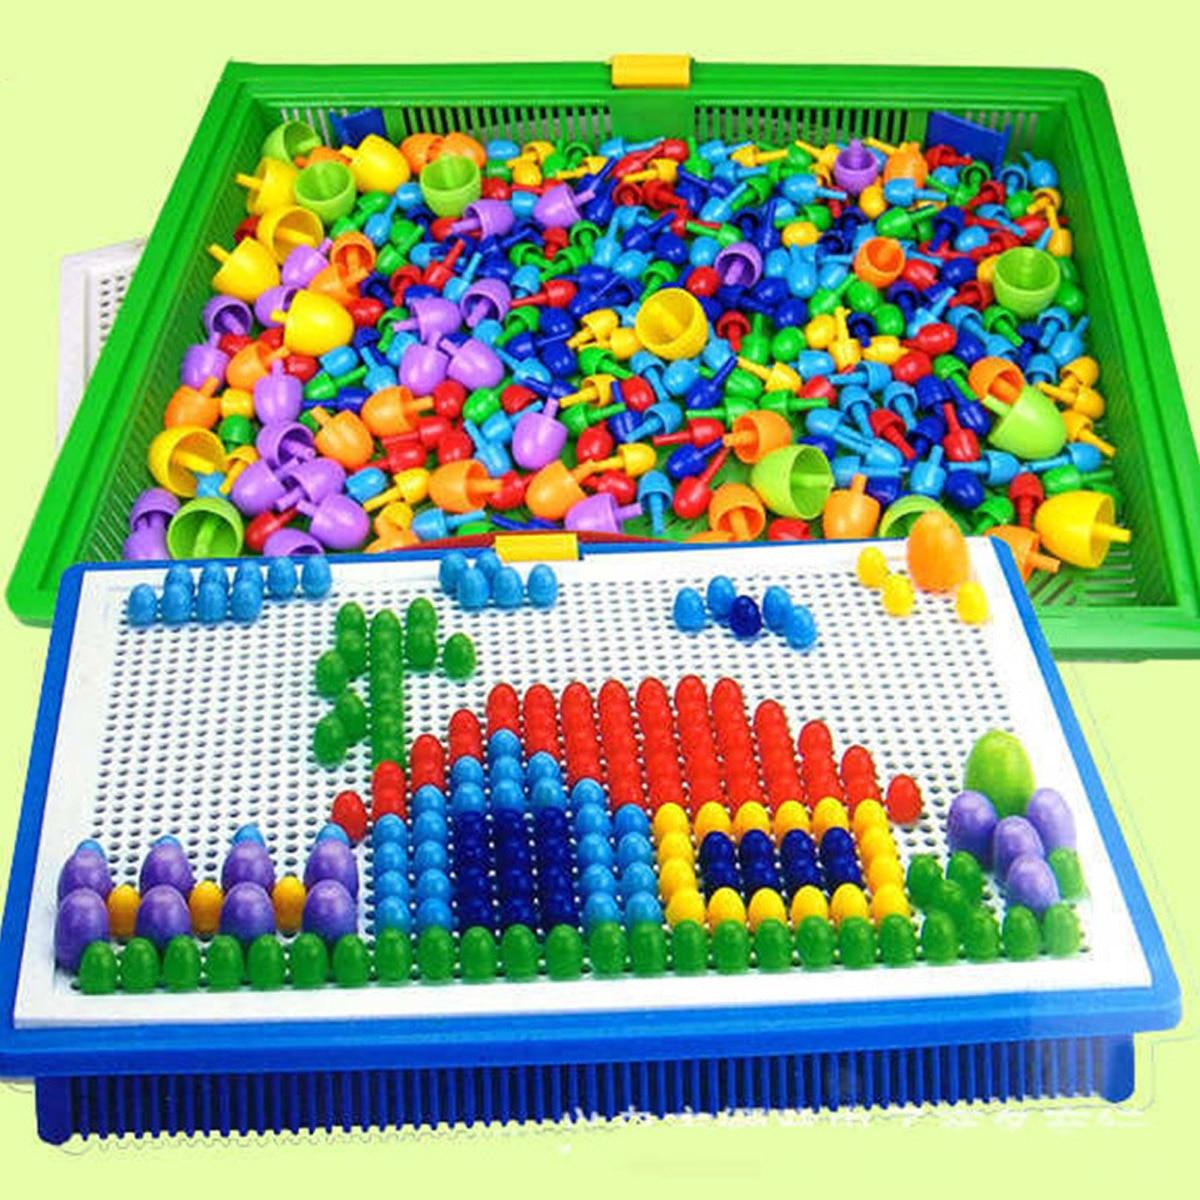 Creative Peg Board With 296 Pegs NIN668